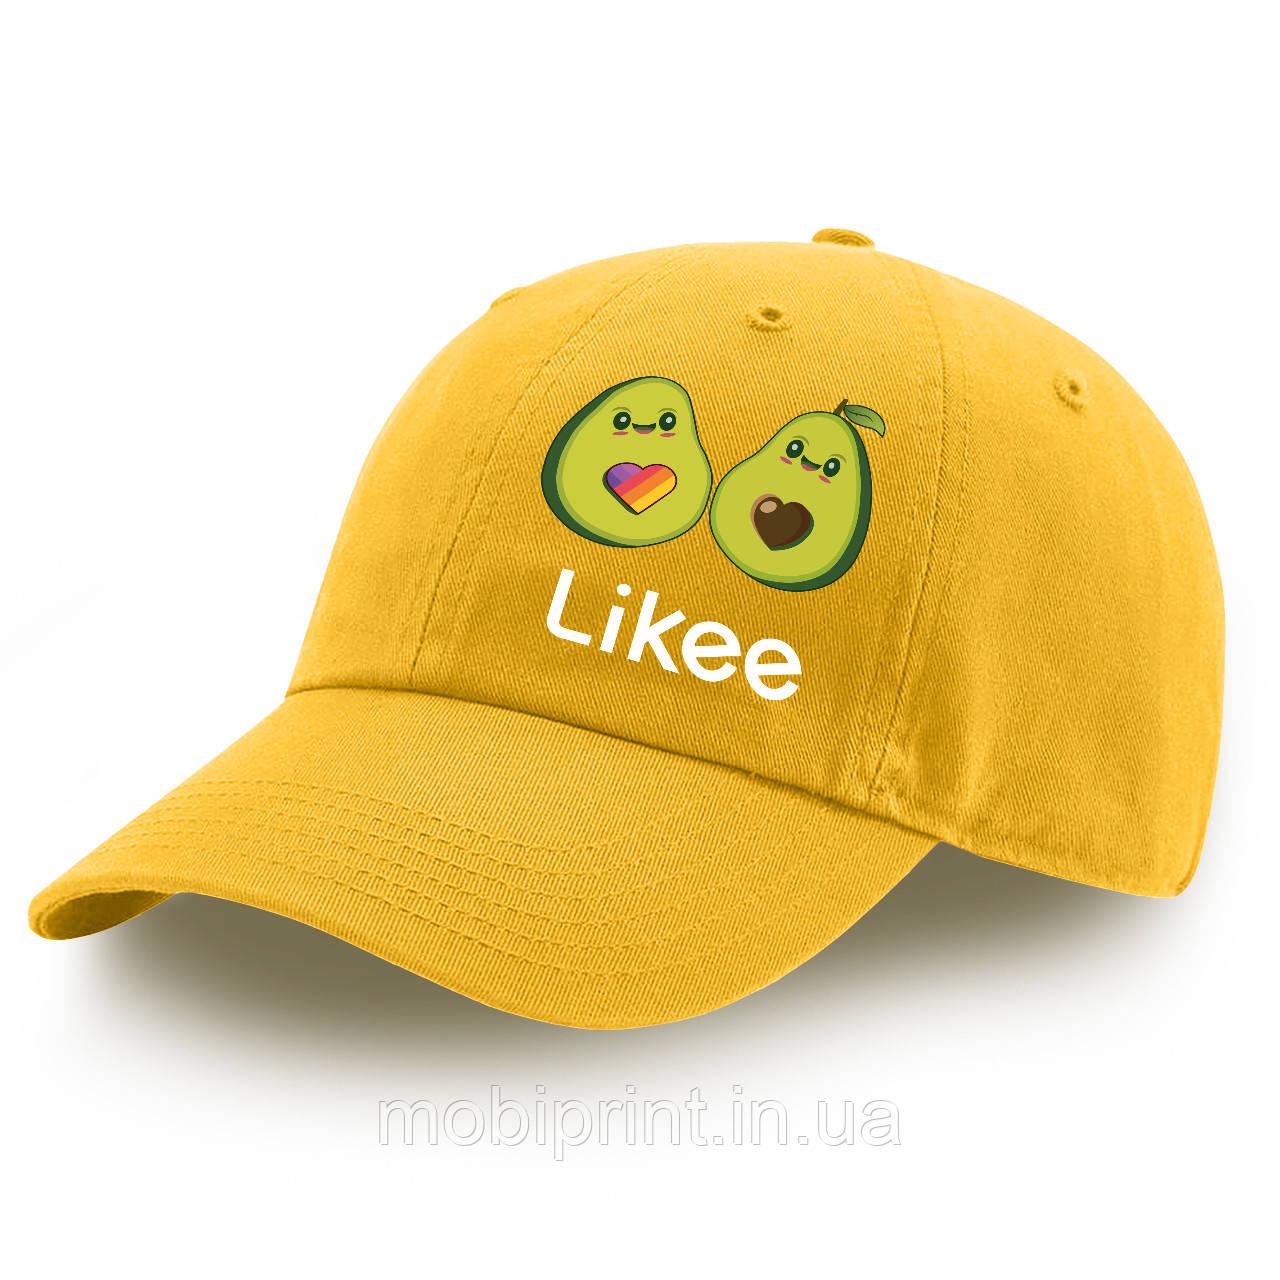 Кепка детская Лайк Авокадо (Likee Avocado) 100% Хлопок (9273-1031)